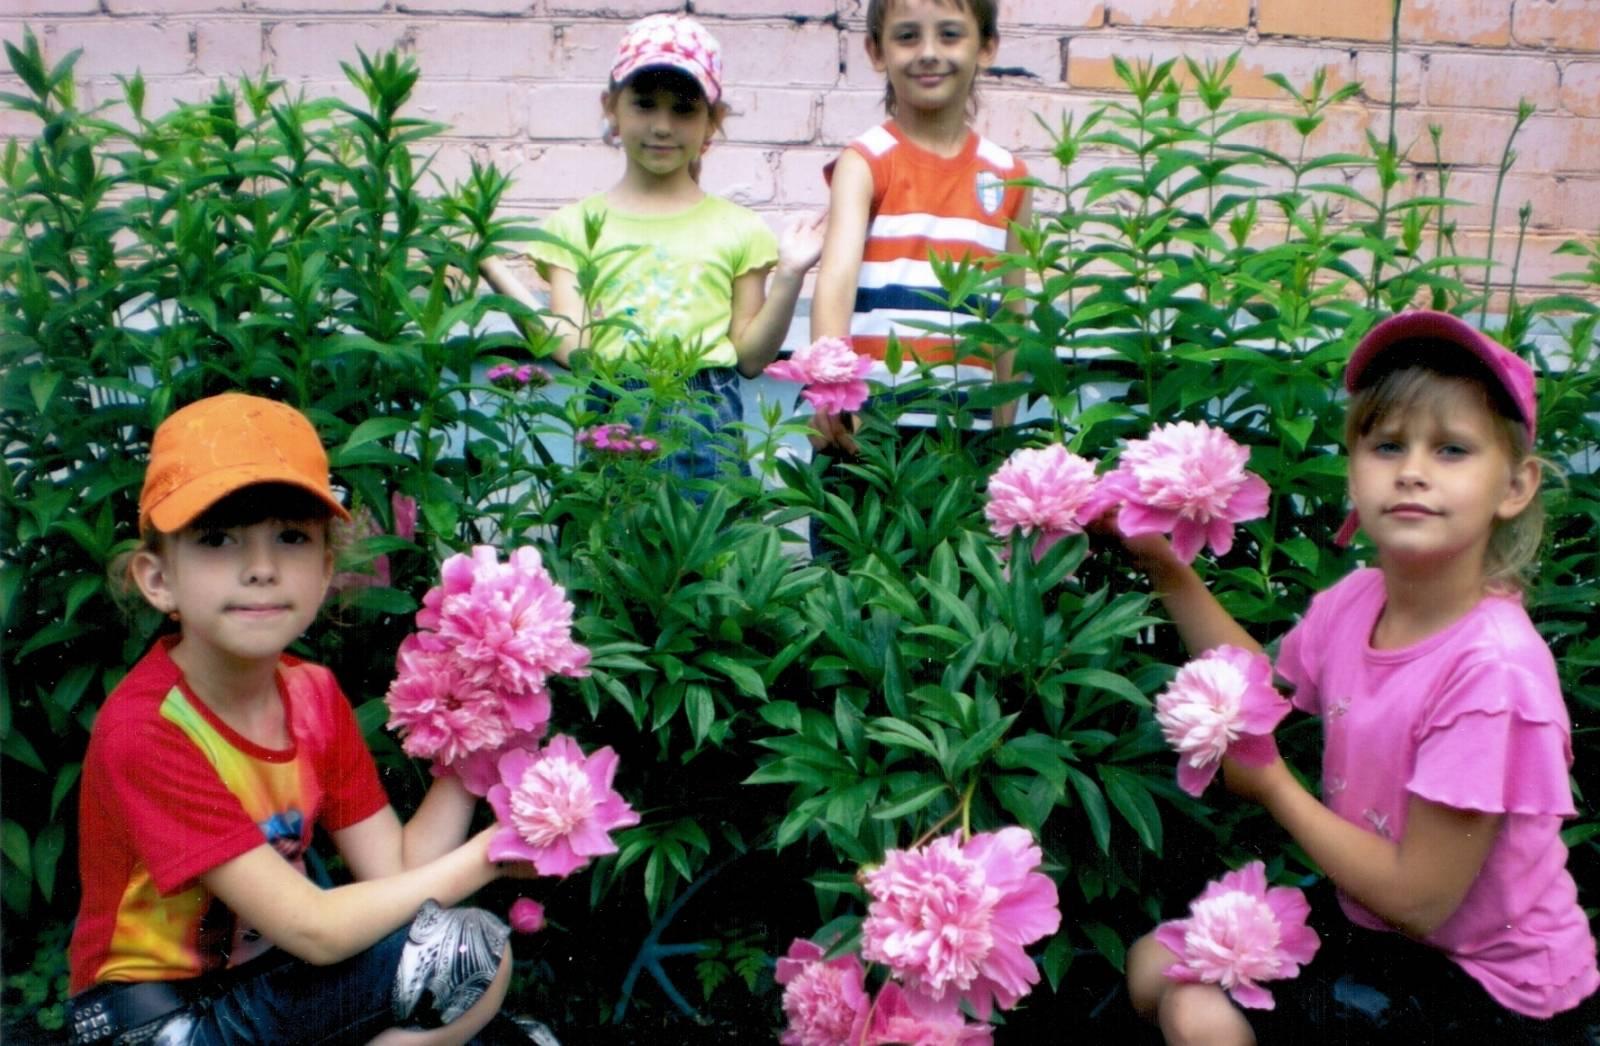 Дети сажают цветы картинки 1